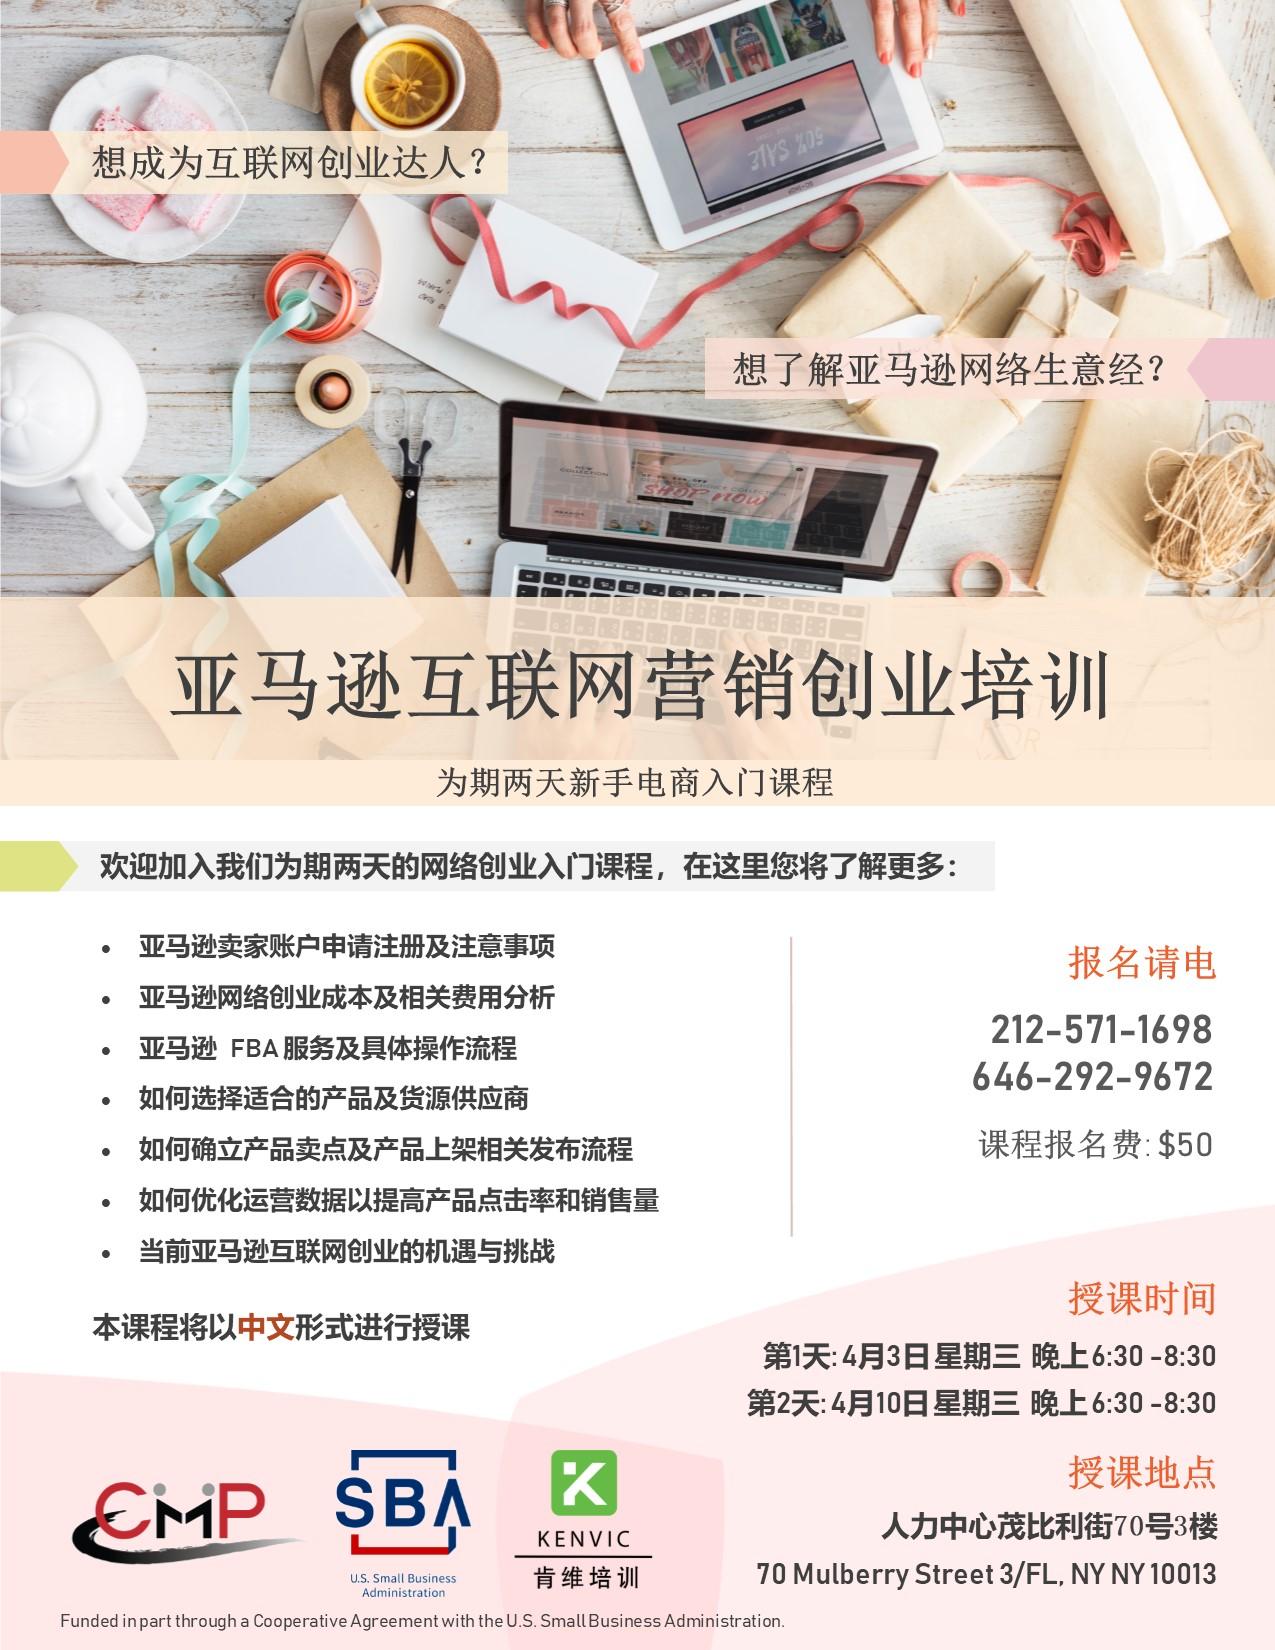 Amazon Training -Chinese Flyer.jpg